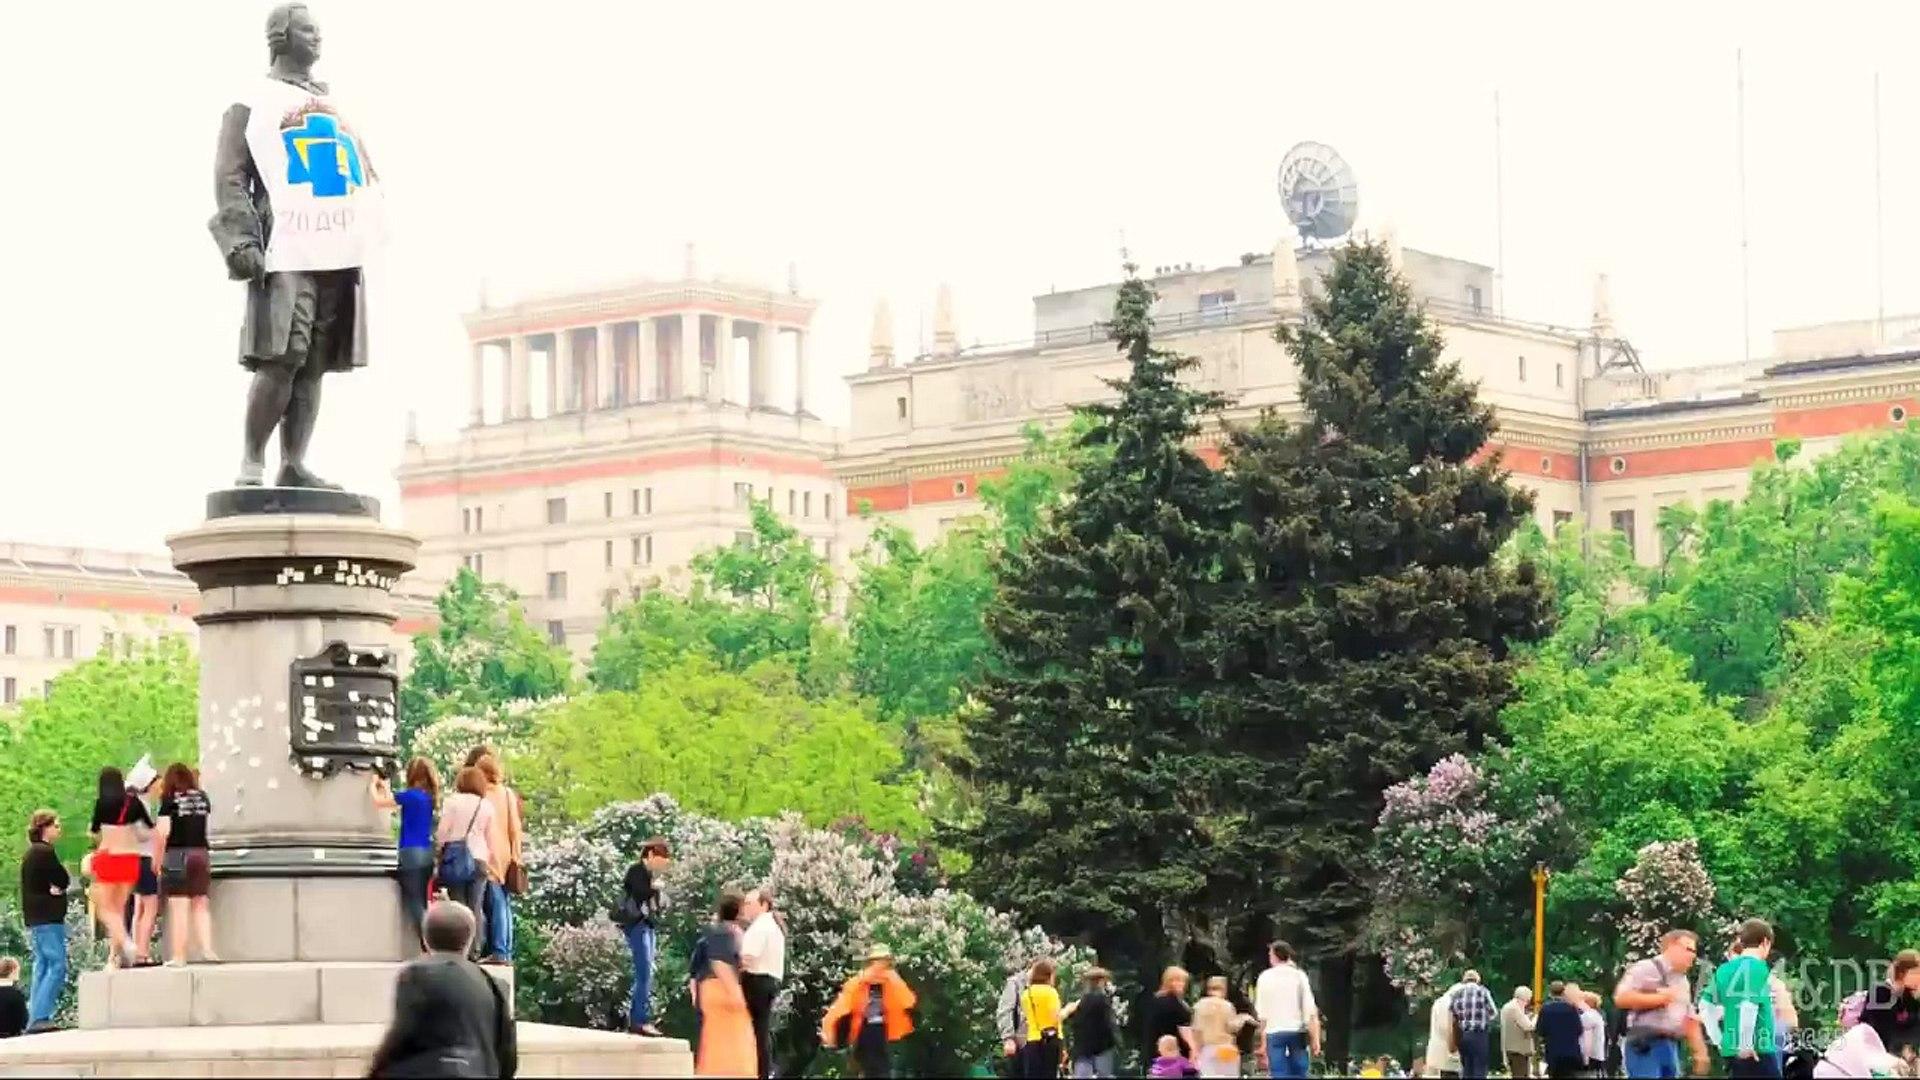 Timelapse: Sparrow Hills, Moscow State University, 2012 / МГУ, Воробьевы горы